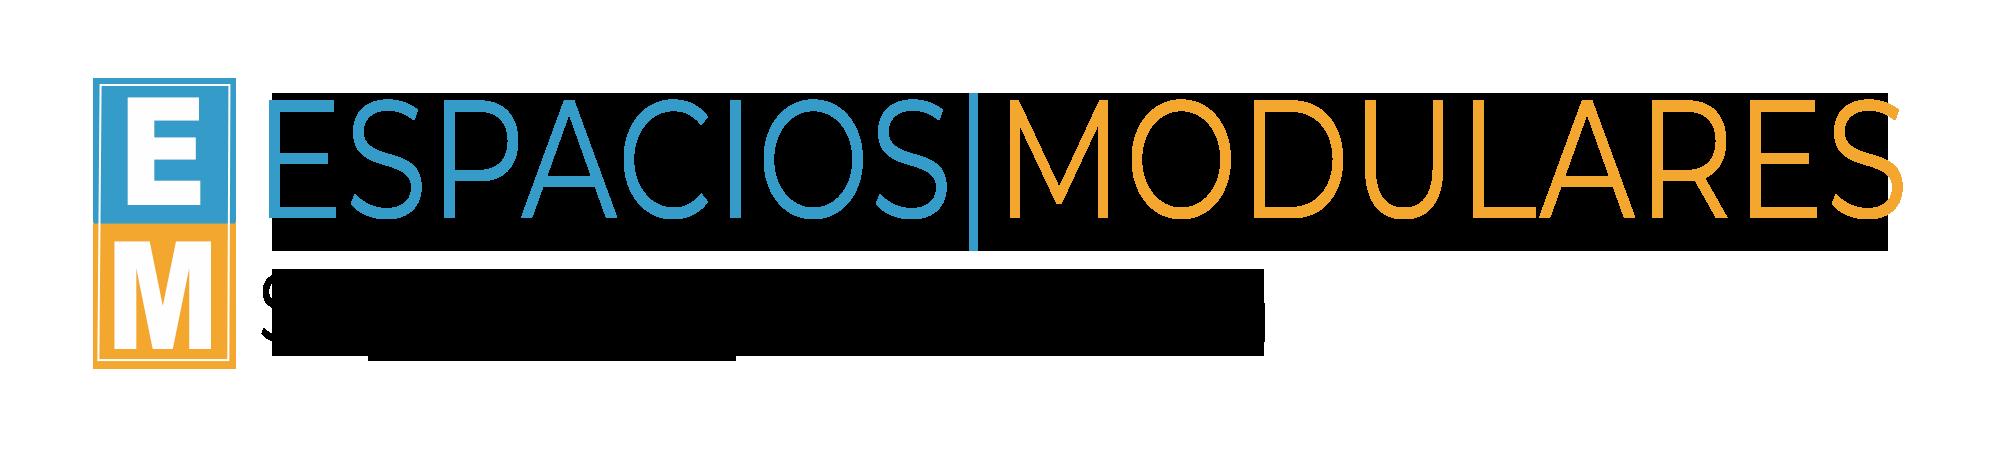 Espacios Modulares - EspaModu